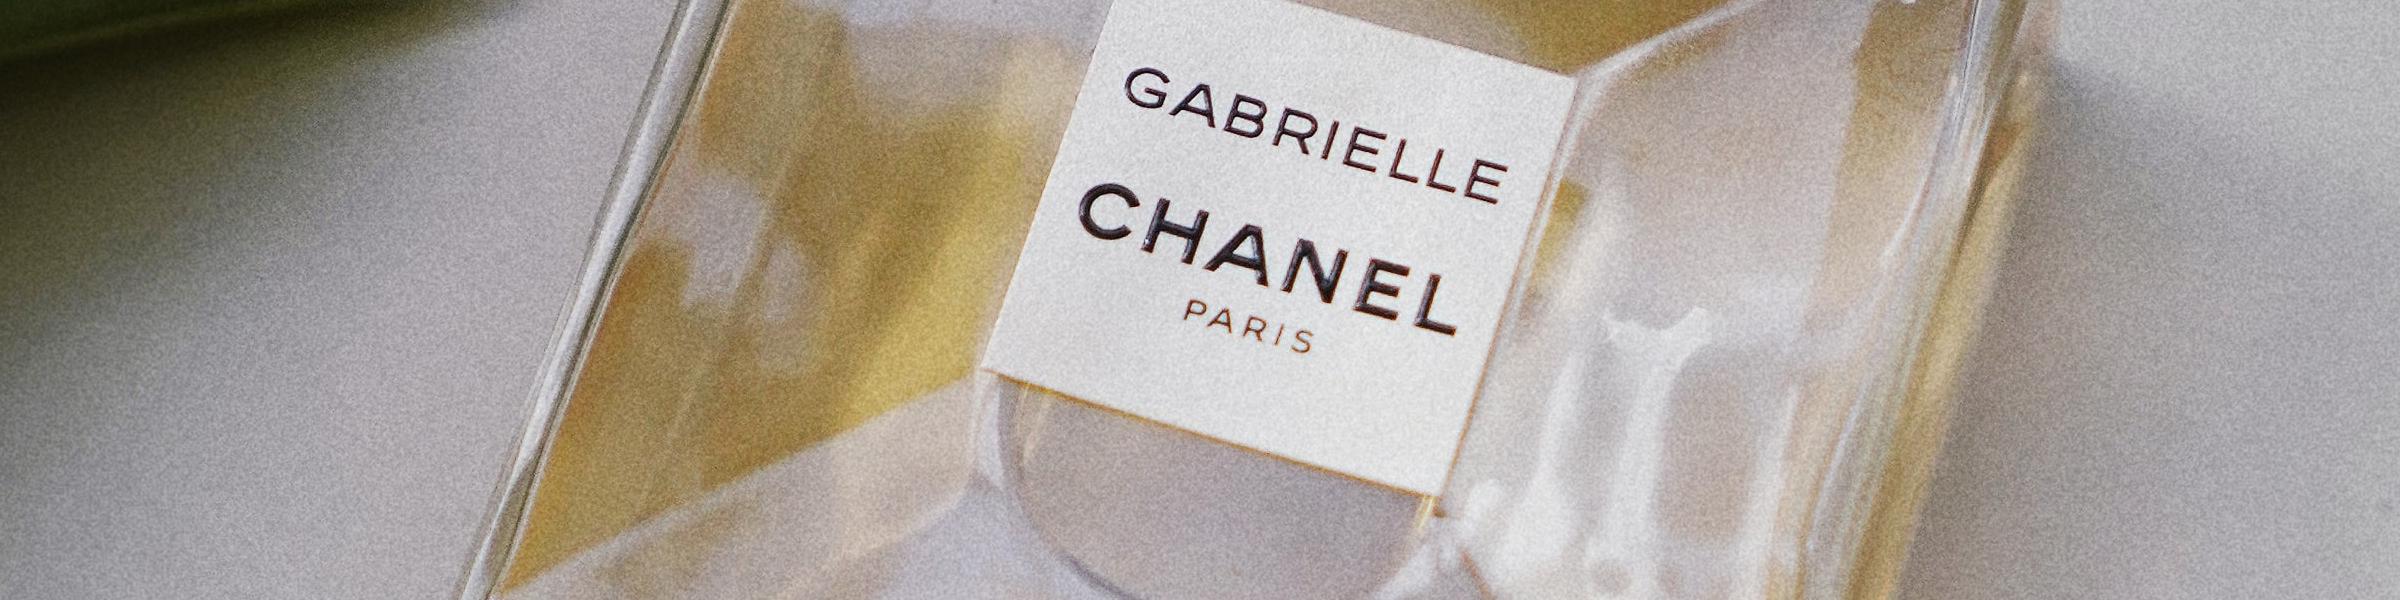 Chanel Paris Perfume